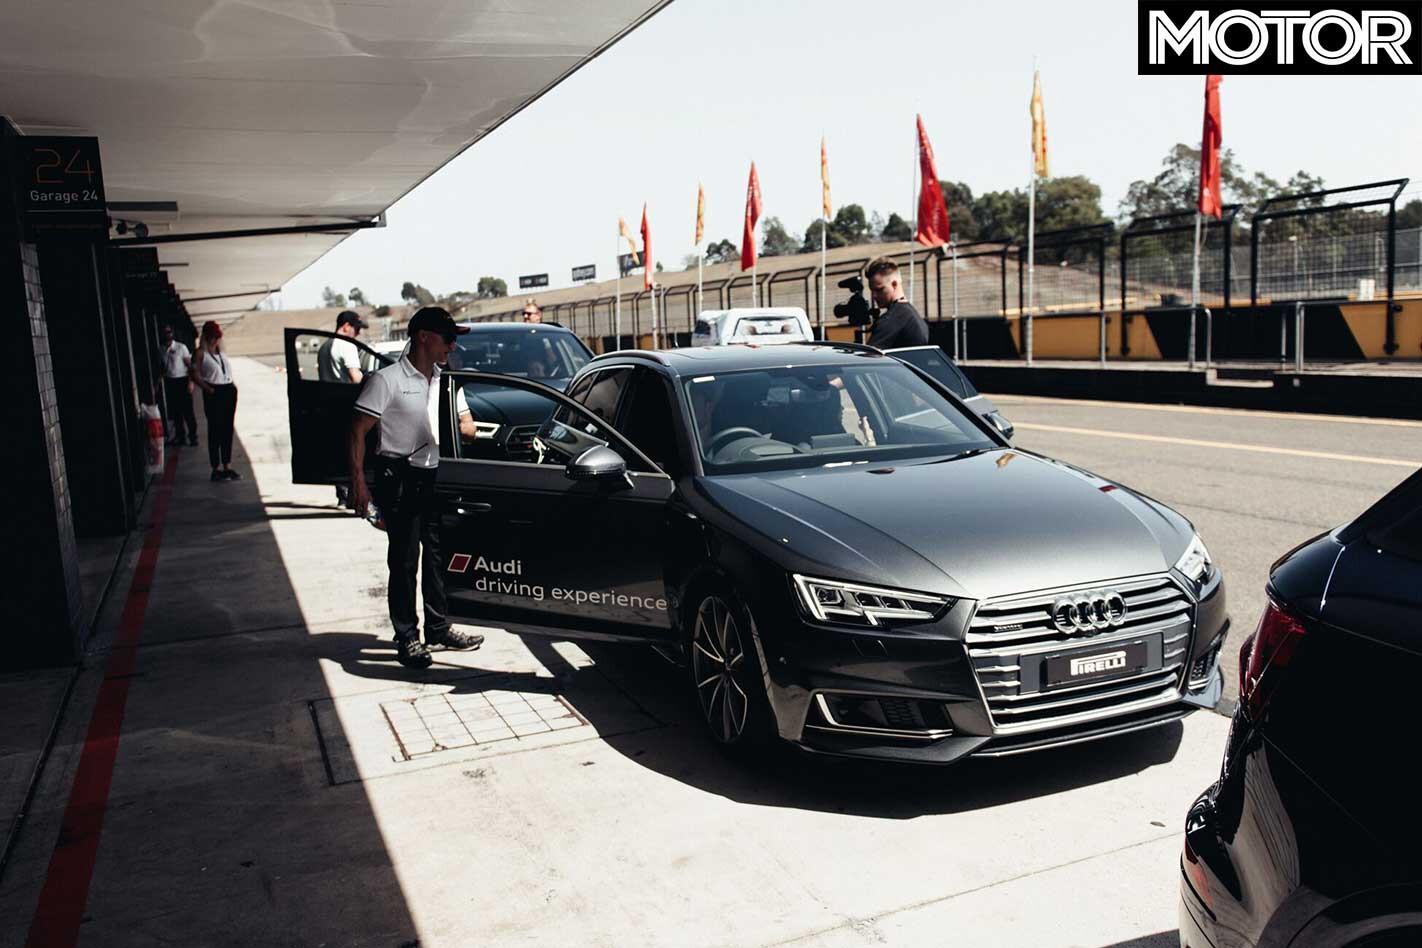 Audi Advanced Driving Experience Pitlane Track Jpg